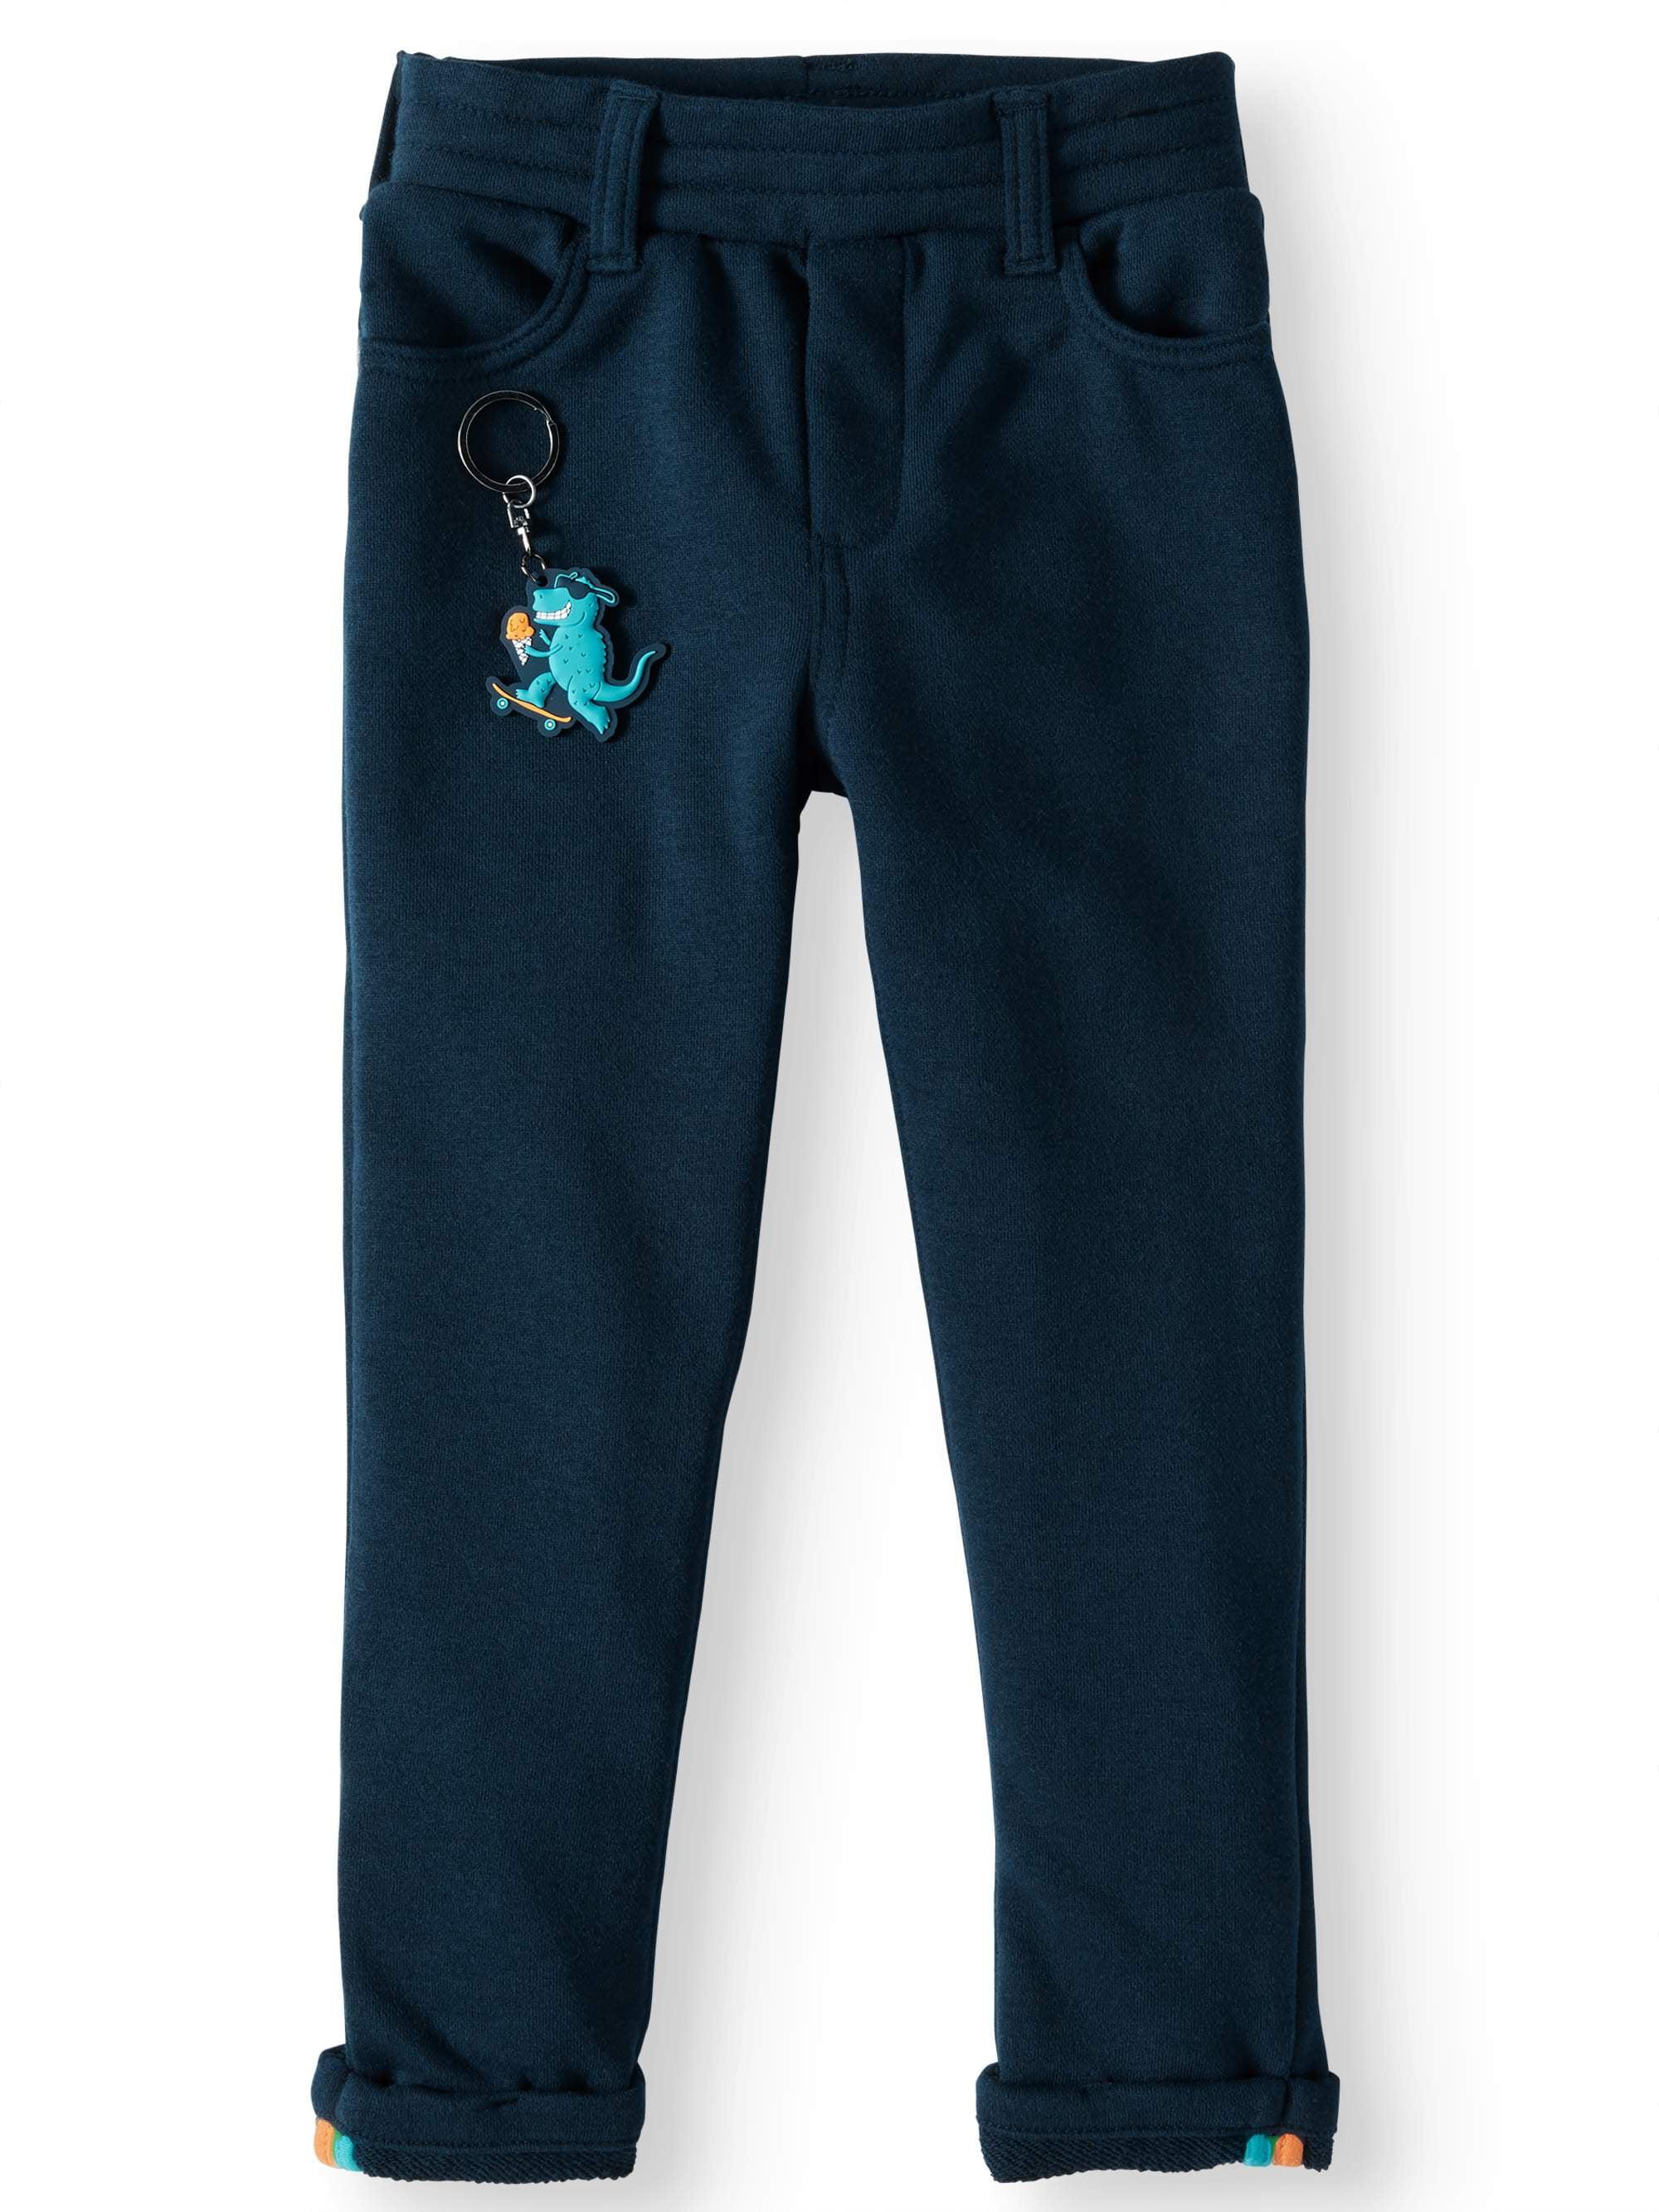 French Terry Slim Pants with Keychain (Little Boy & Big Boy)